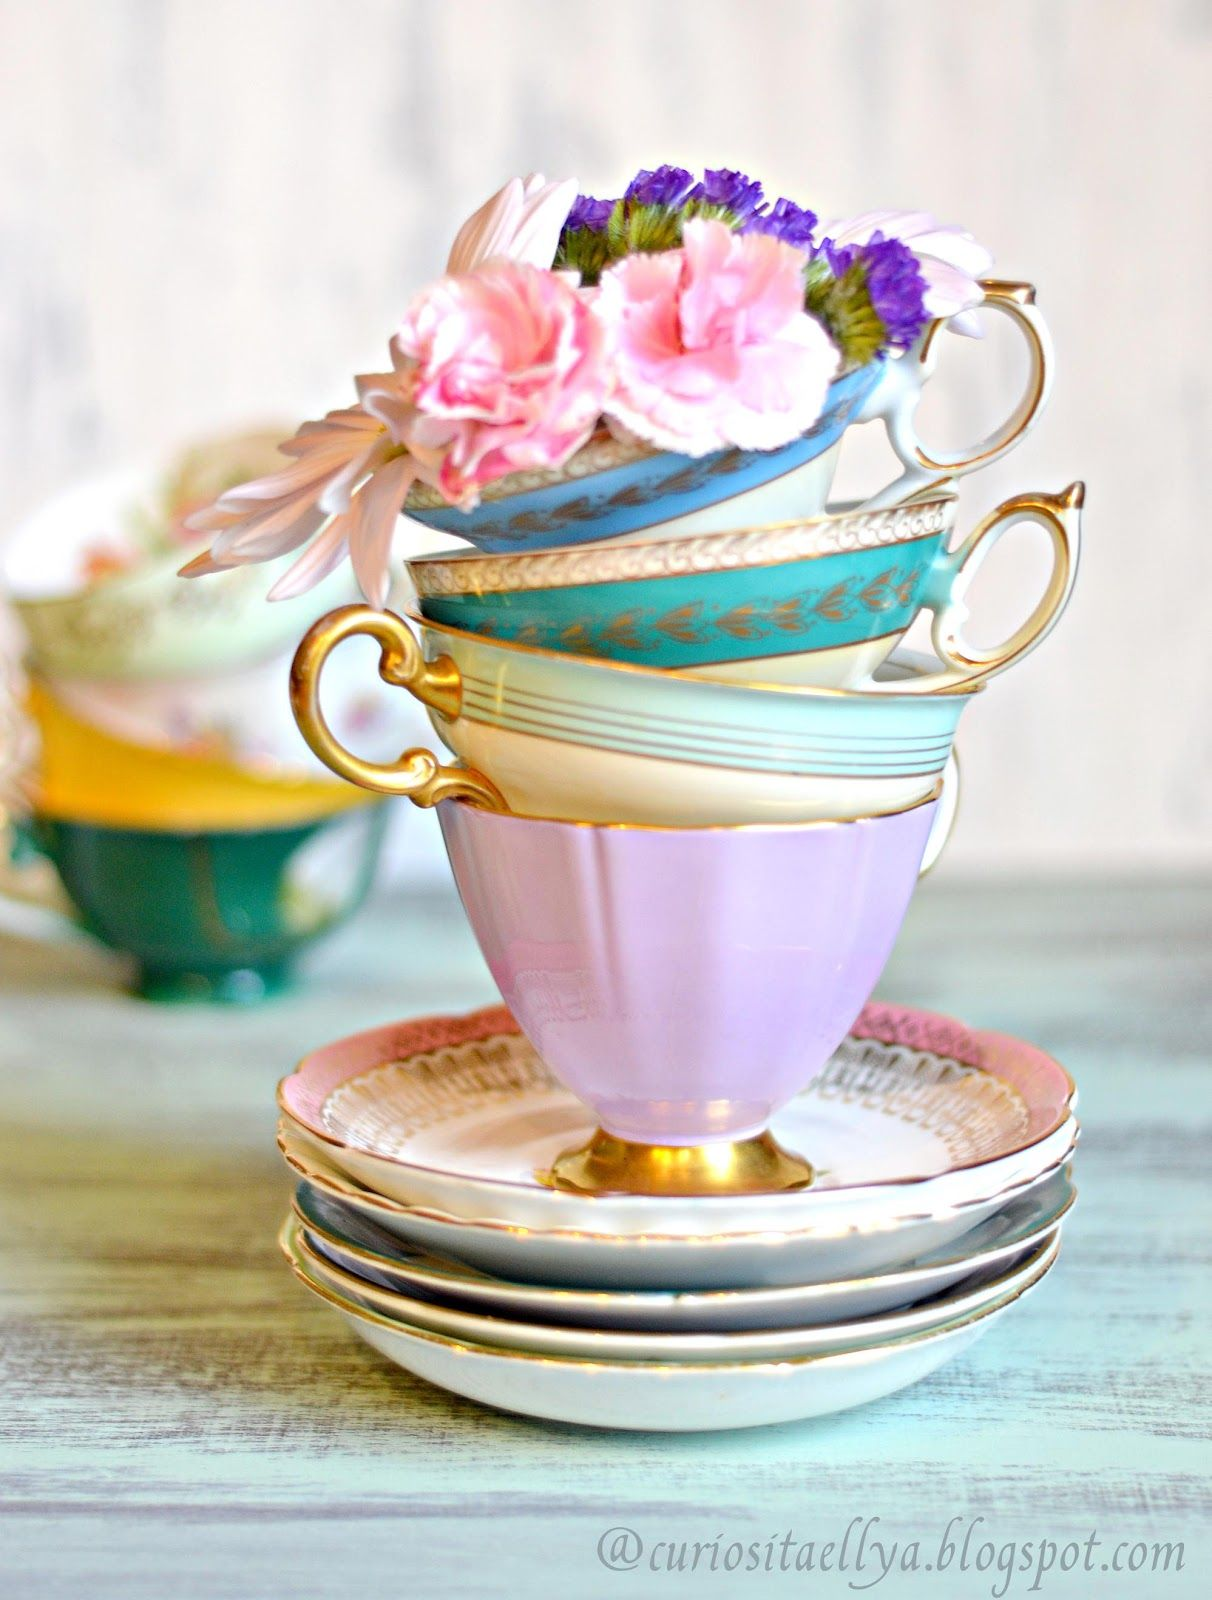 Vintage Tea Cups Part - 34: Tea Cups | Curiositaellya: Vintage Tea Cups Love Affair